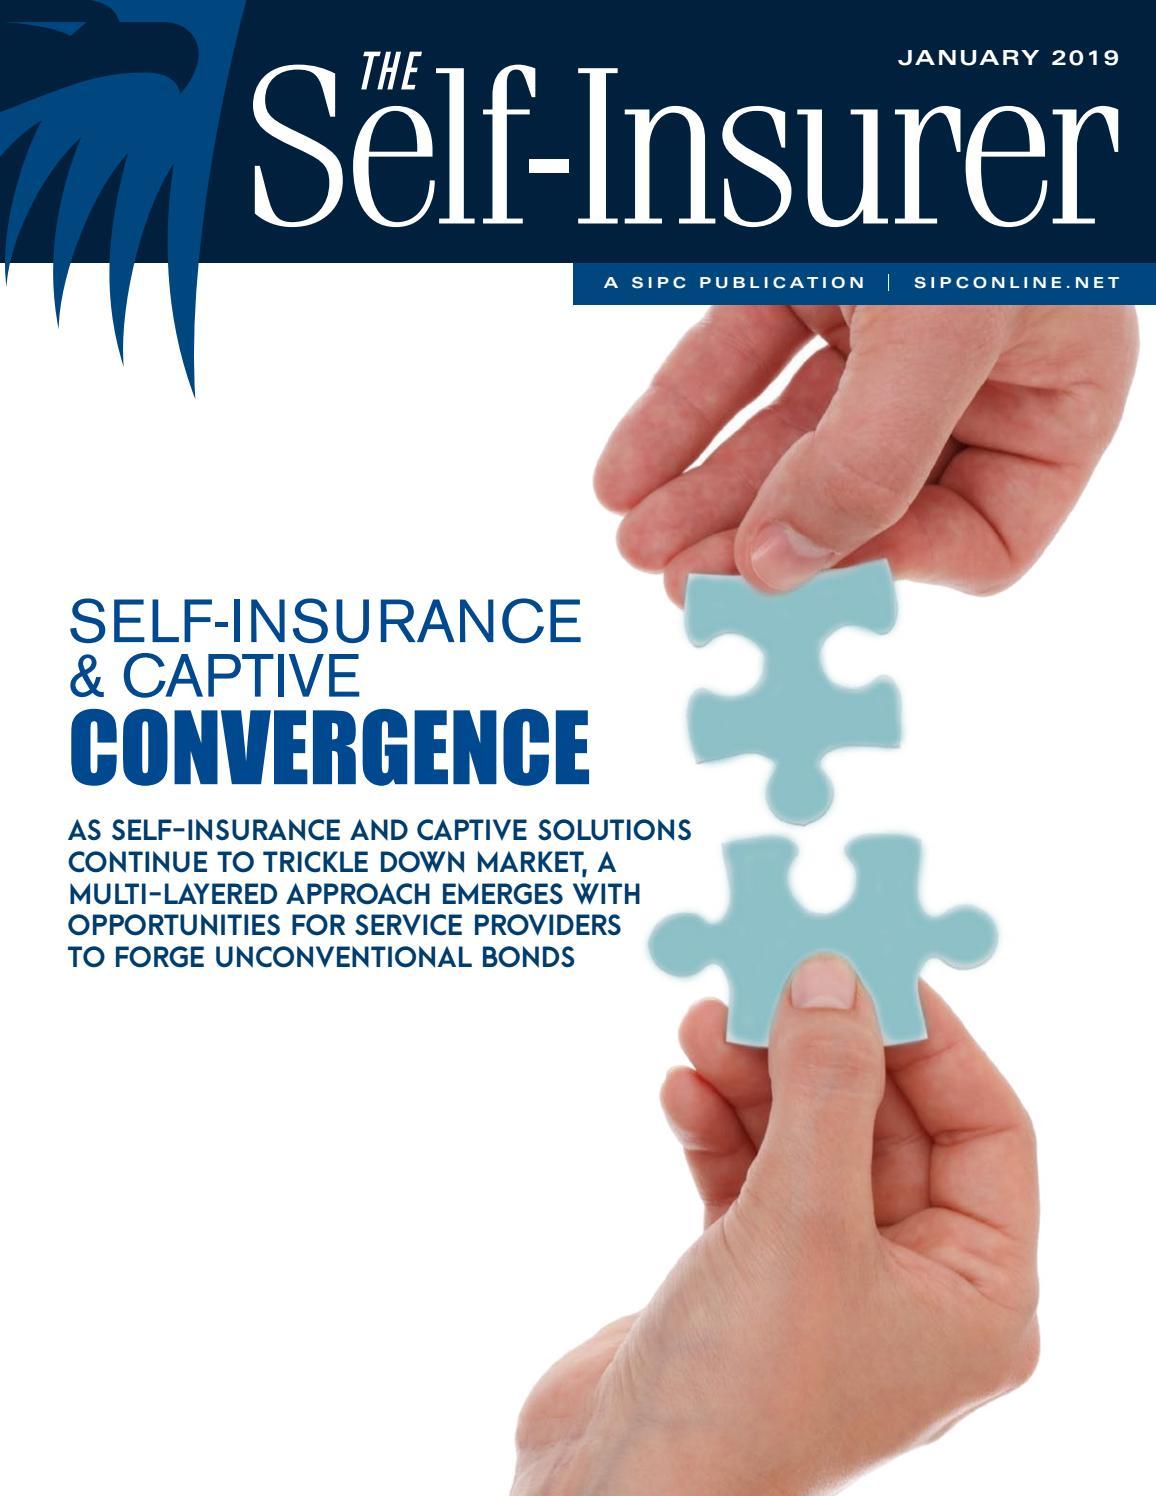 Self Insurer January 2019 by SIPC - issuu